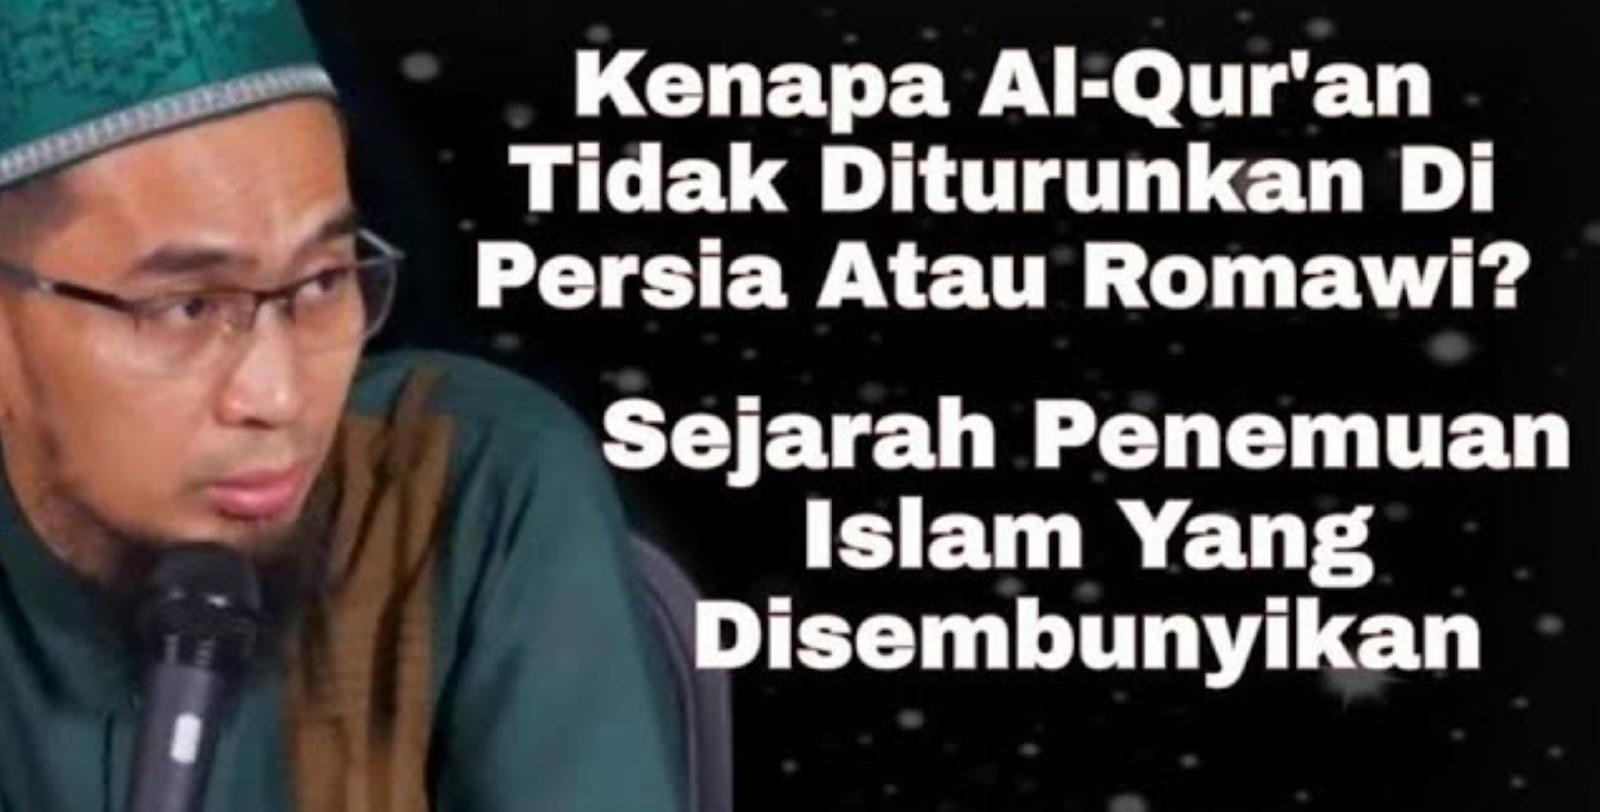 Mengapa Al-Qur'an Tidak Diturunkan di Romawi? Kupas Sejarahnya